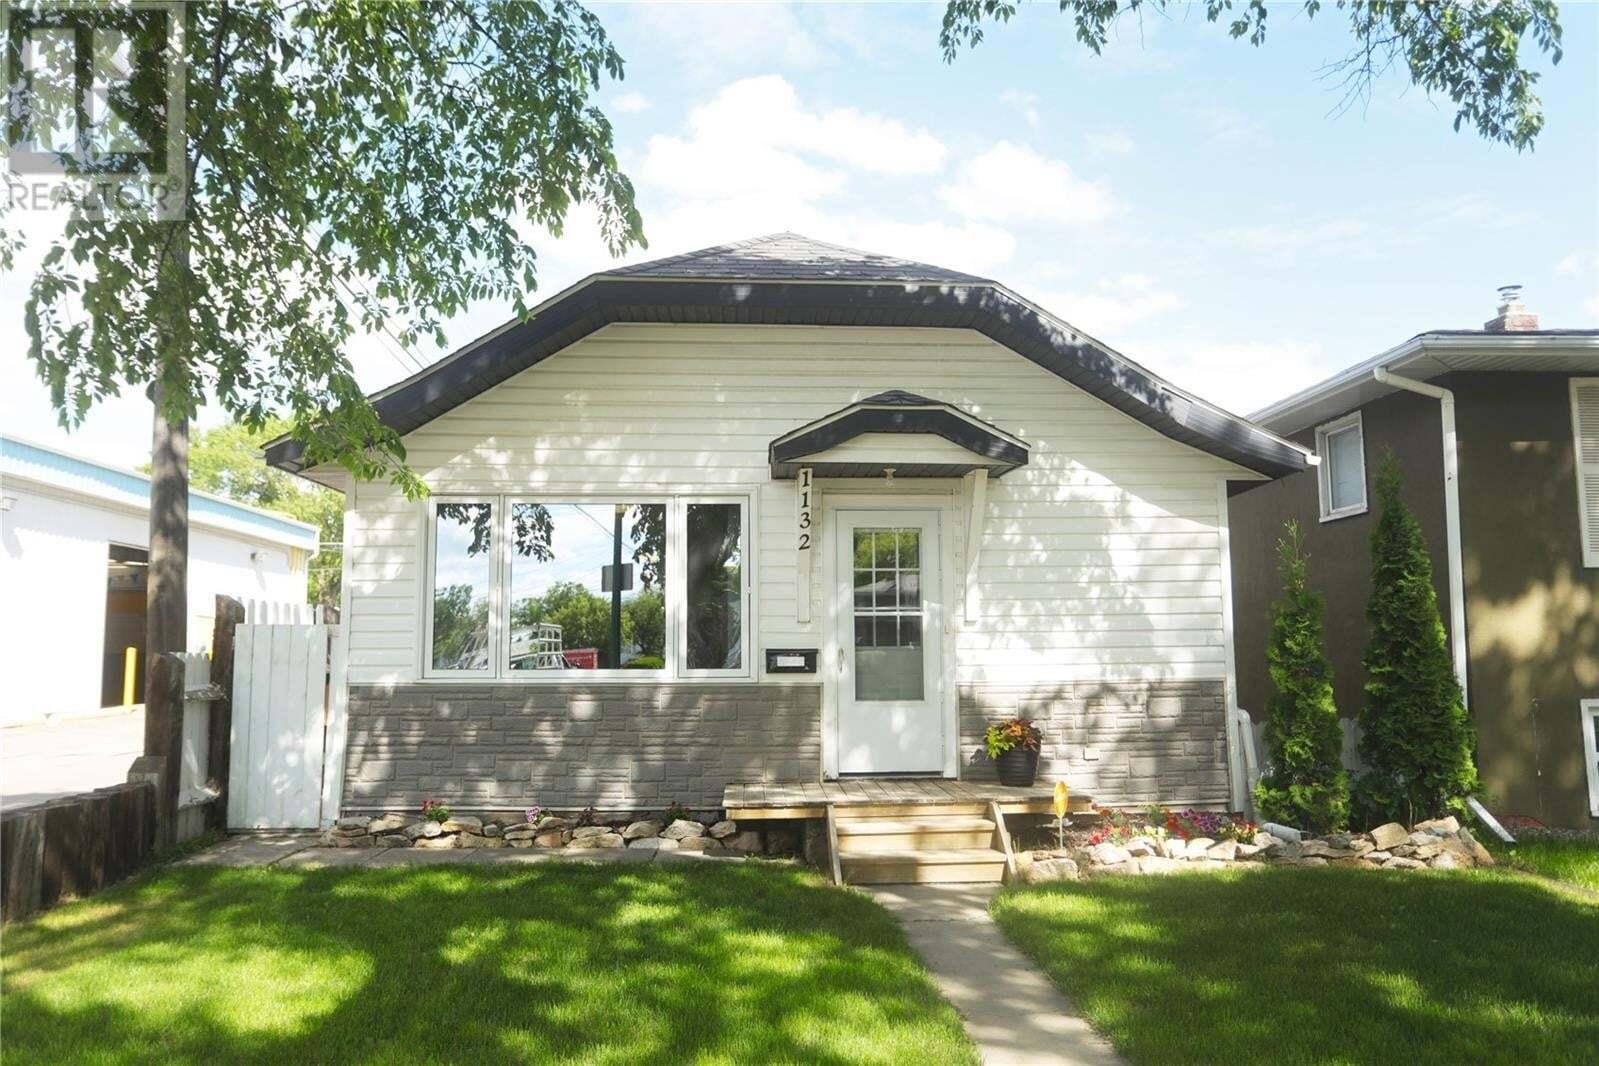 House for sale at 1132 D Ave N Saskatoon Saskatchewan - MLS: SK813869